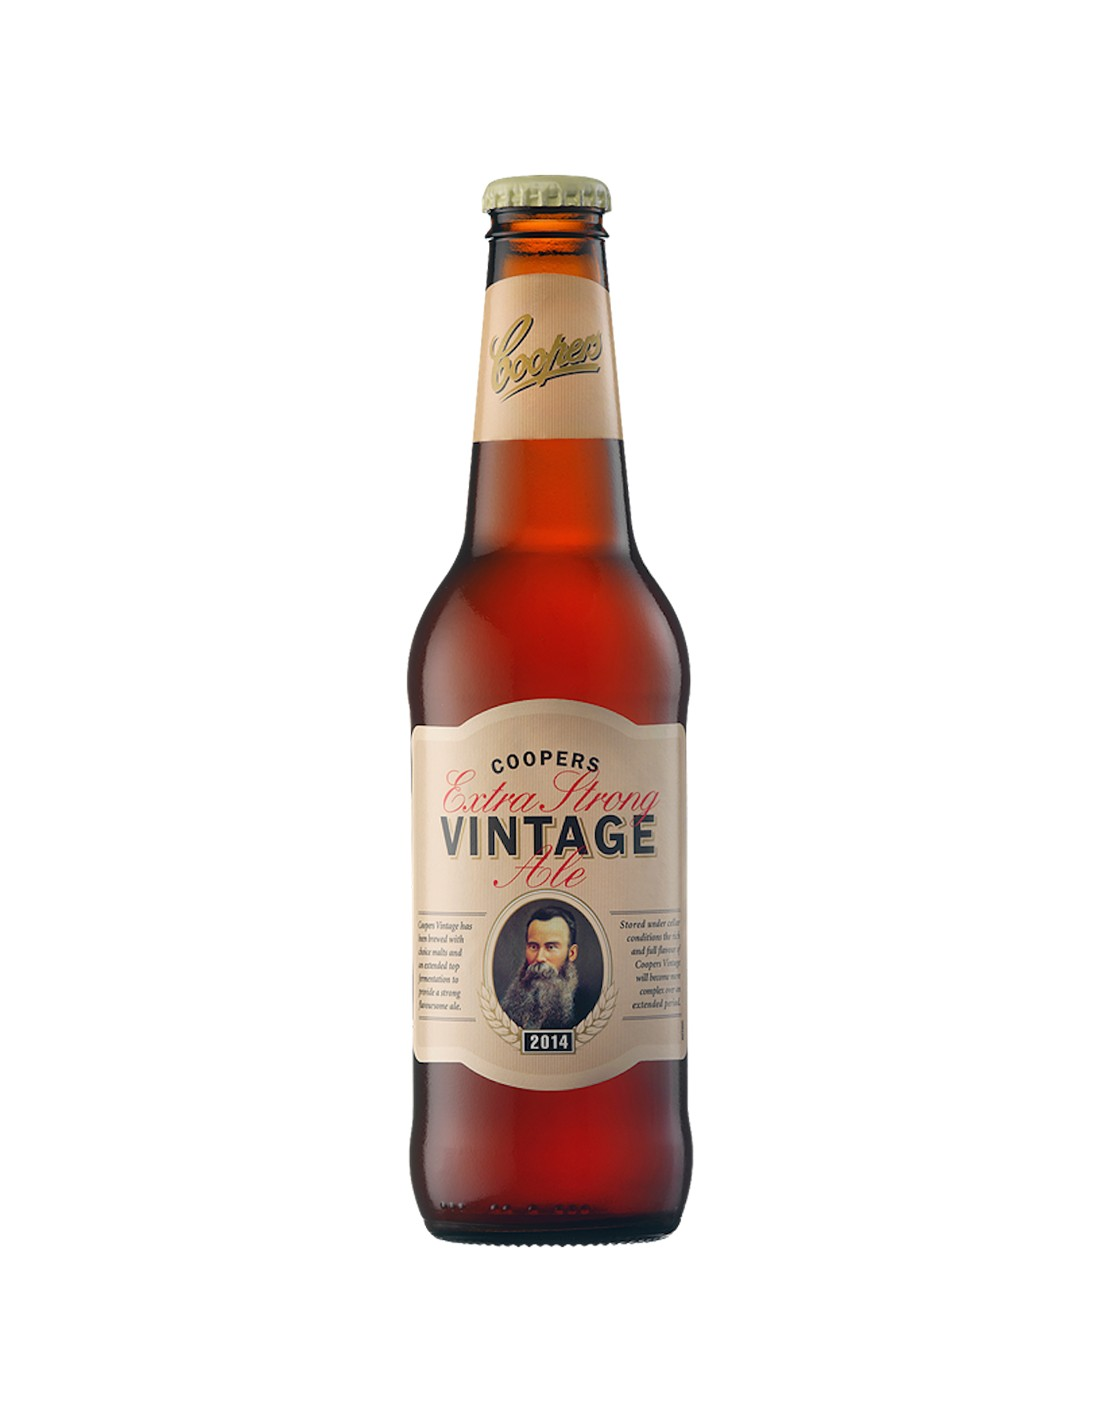 Bere blonda Ale, Coopers Vintage, 2014, 7.5% alc., 0.35L, Australia image0